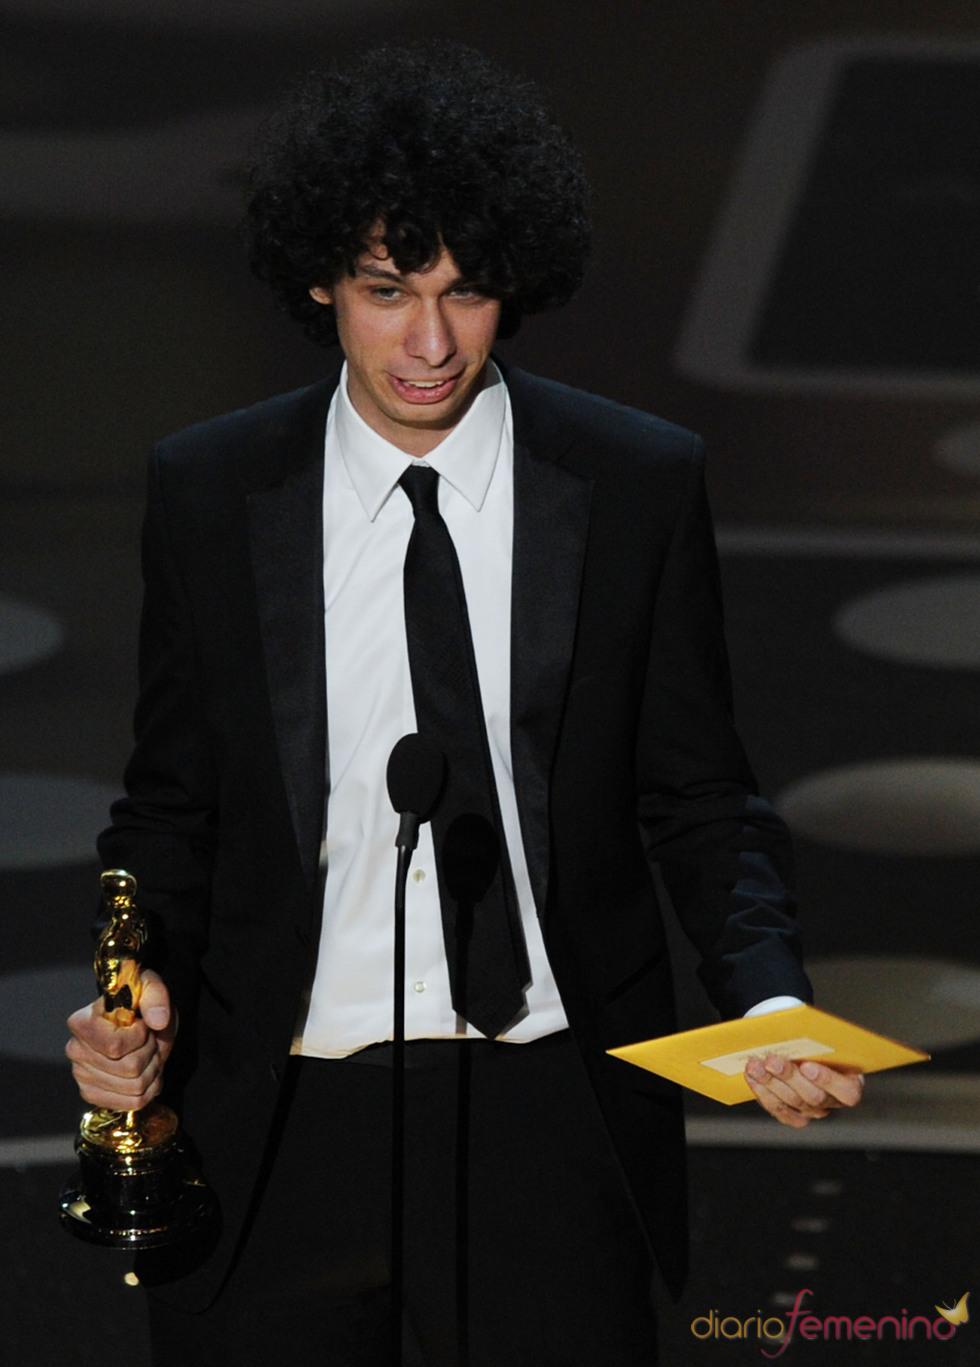 Mejor corto para 'God of Love'. Oscar 2011